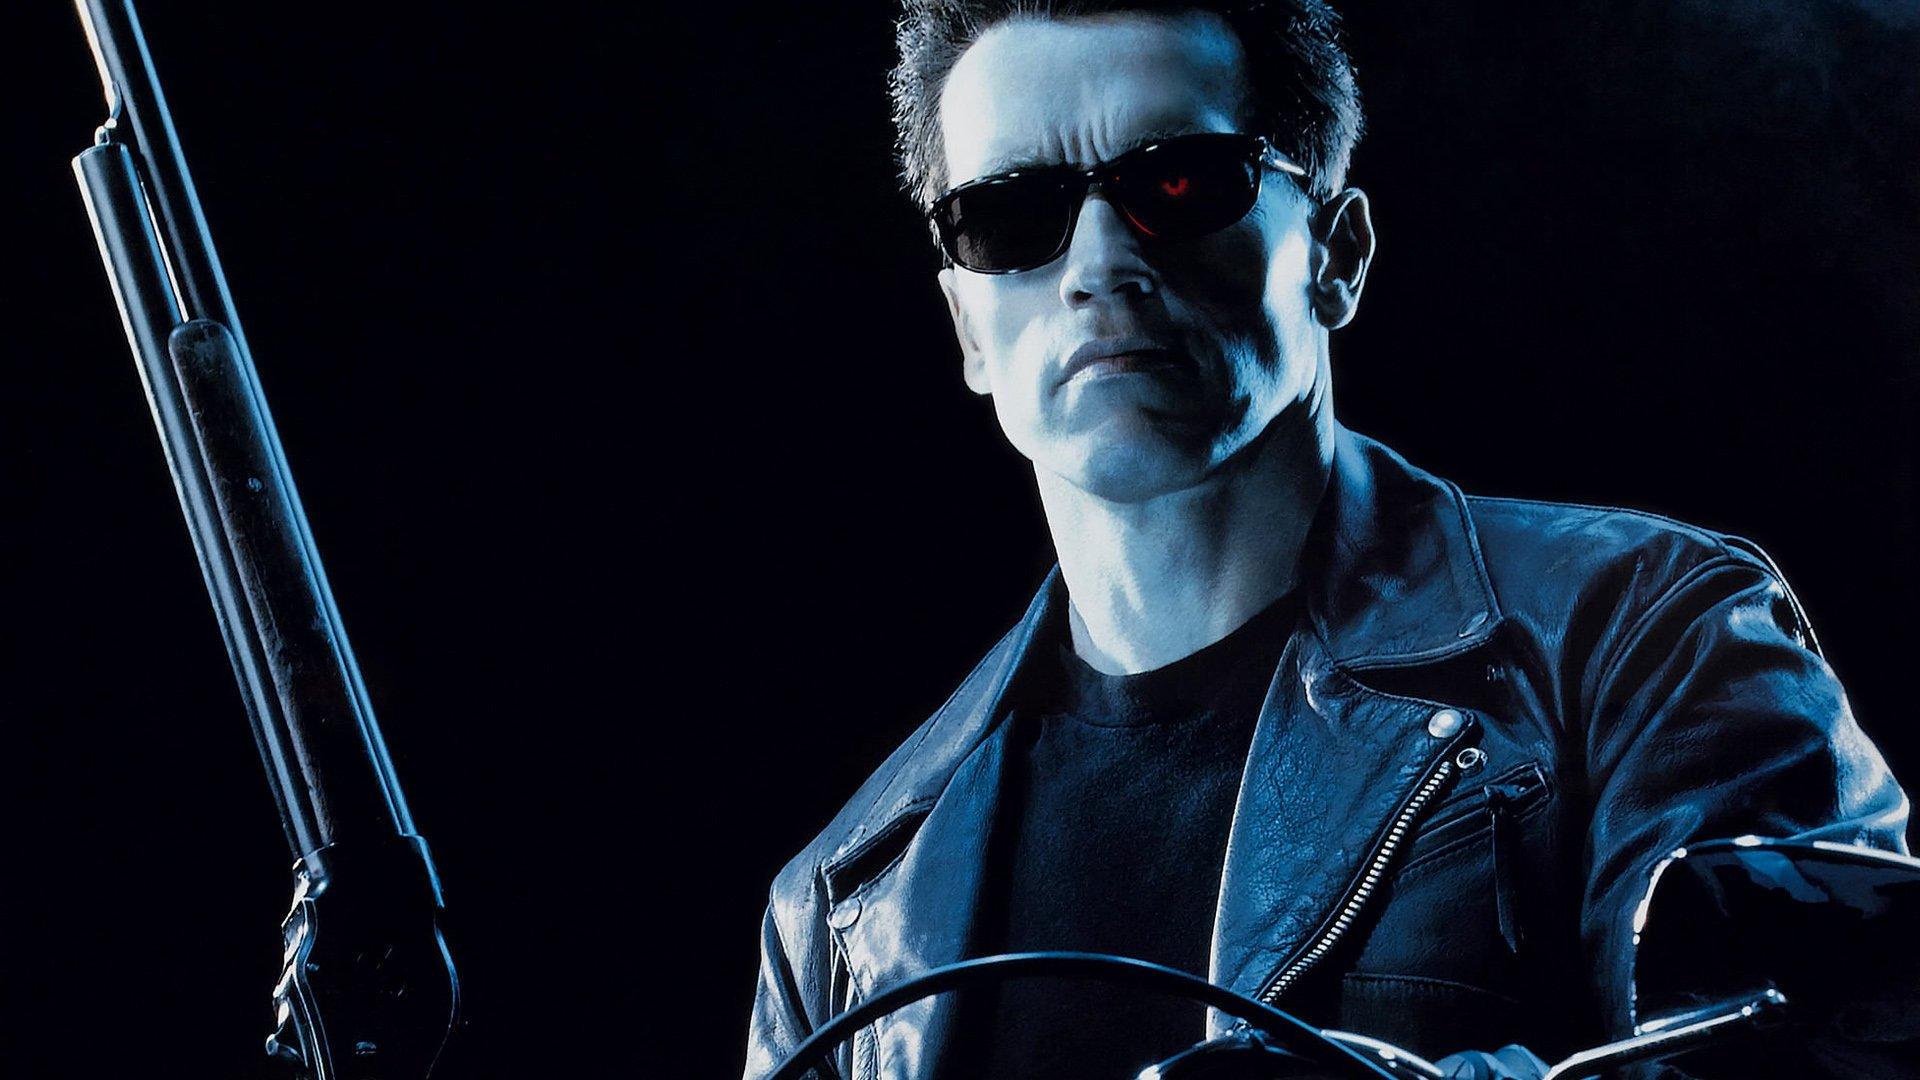 Terminator 2 judgment day hd wallpaper background image 1920x1080 id 209148 wallpaper abyss - Terminator 2 wallpaper hd ...